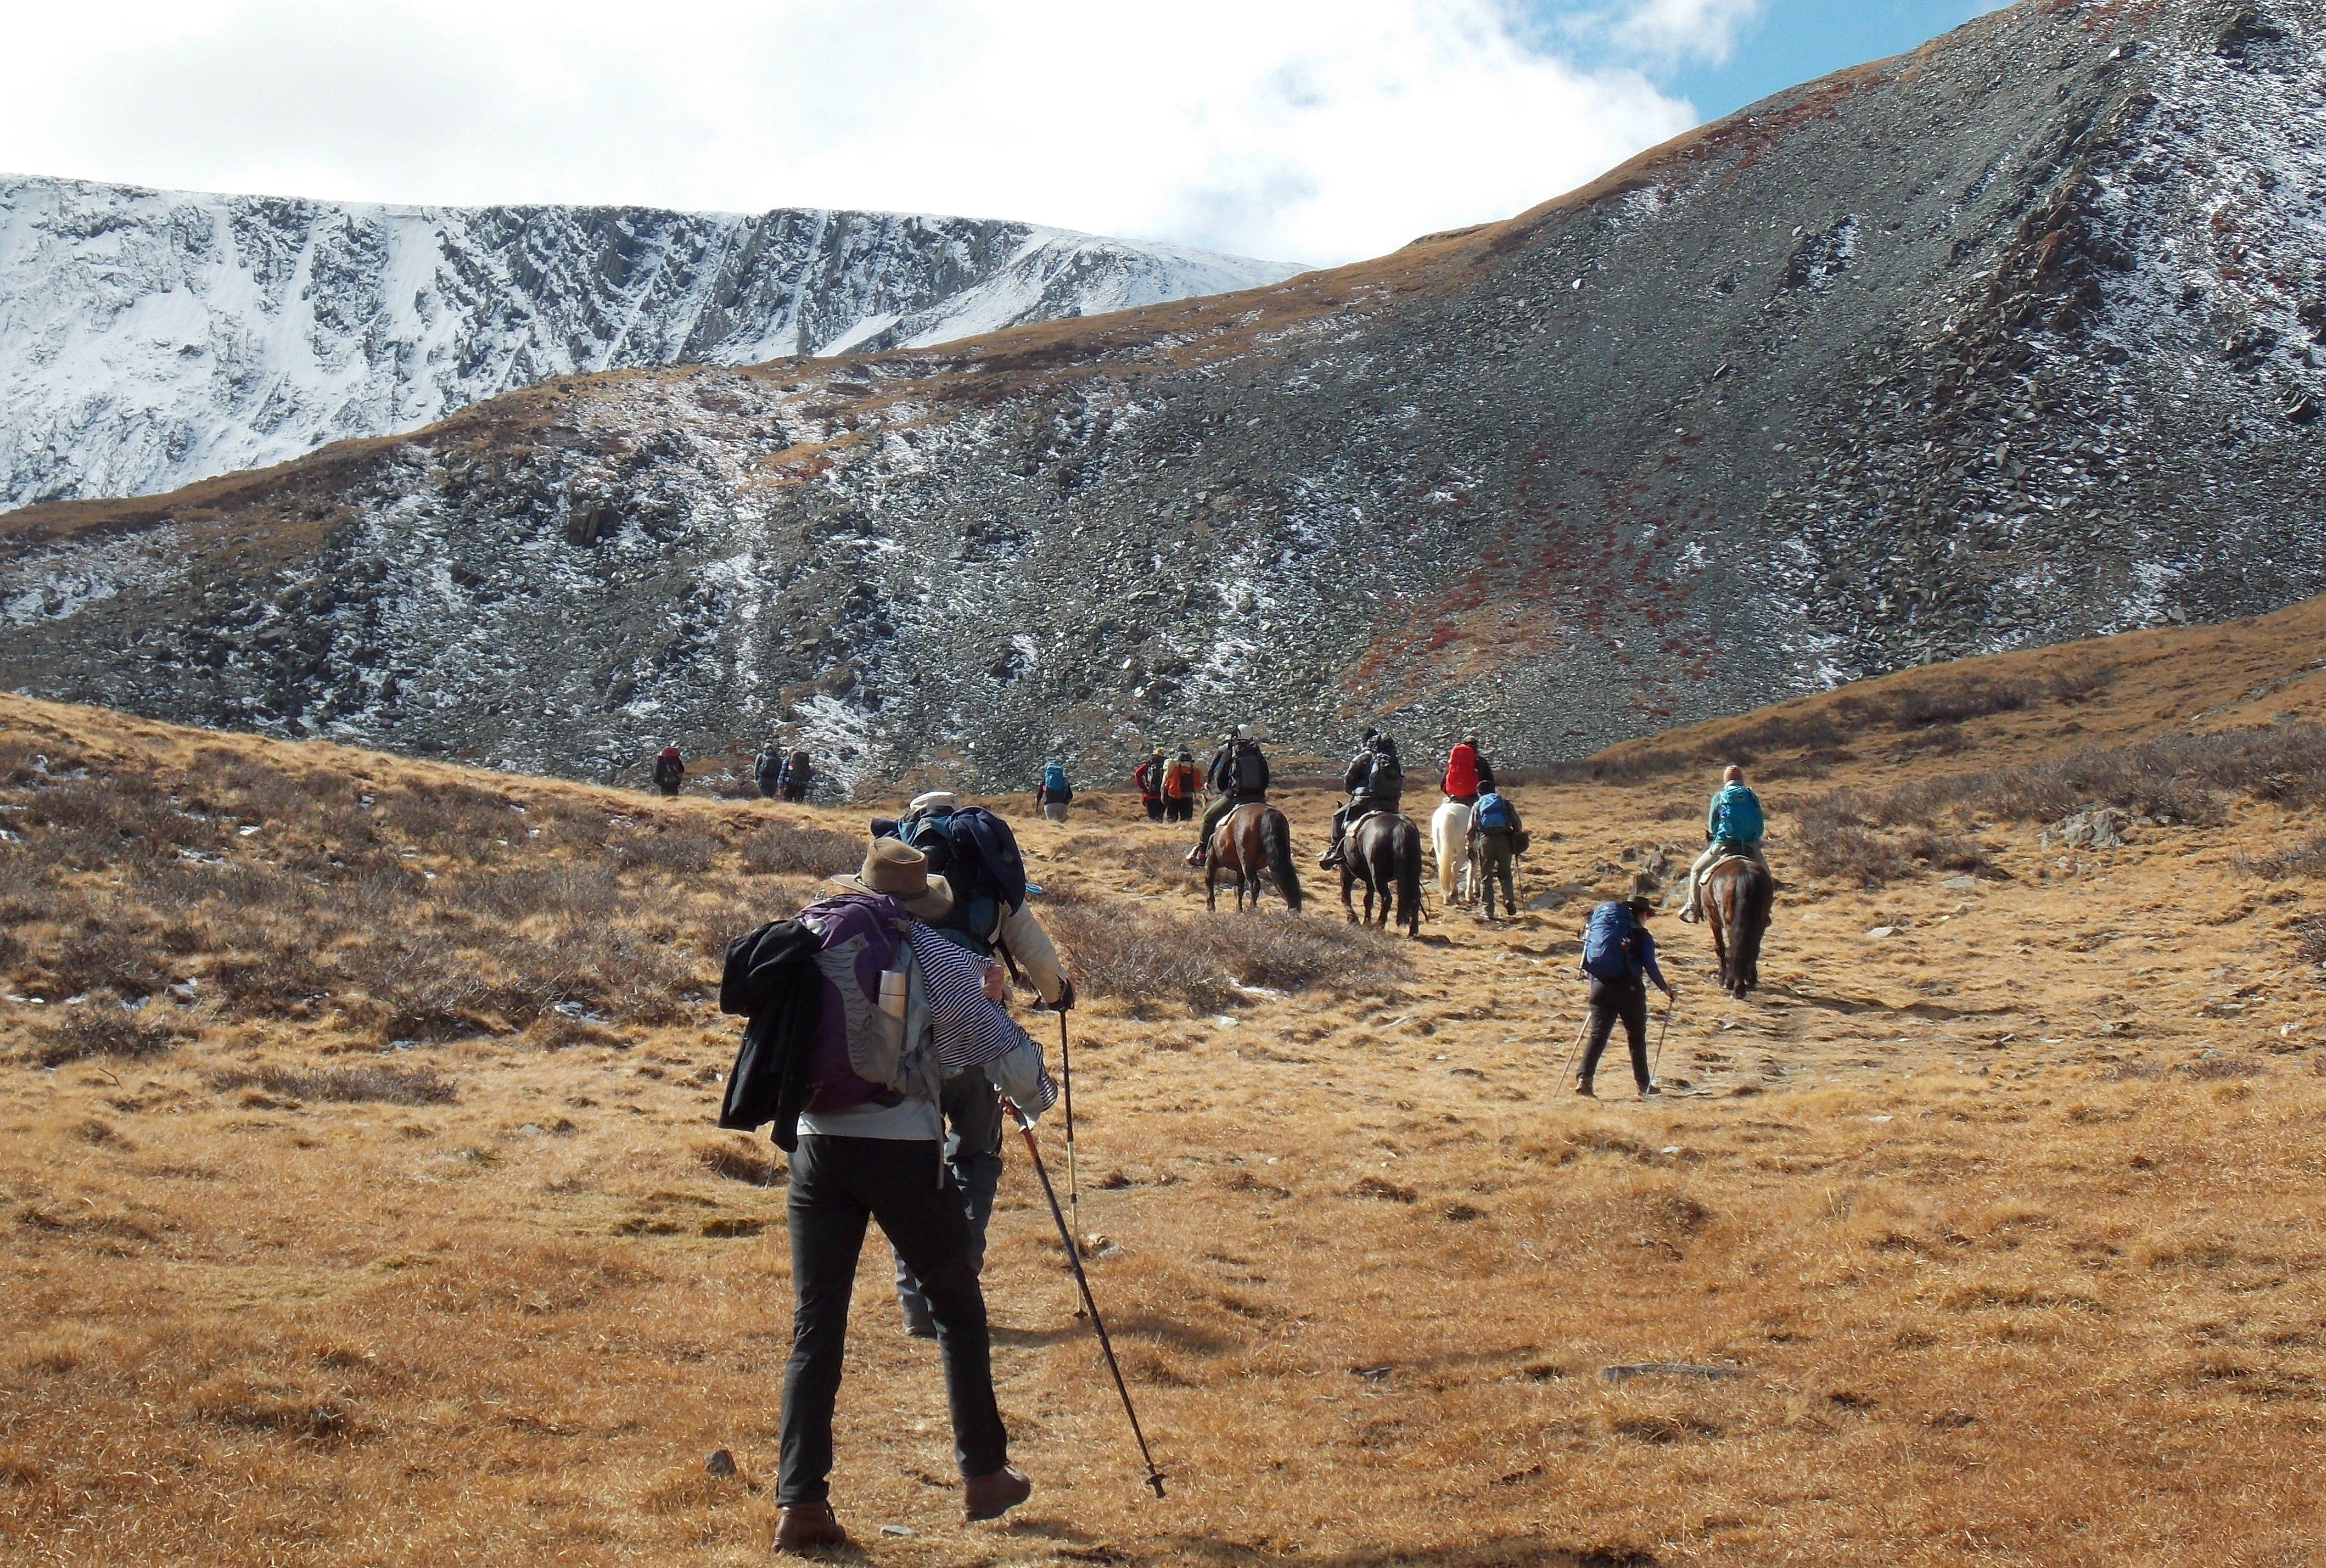 Altai trekking tour in western mongolia